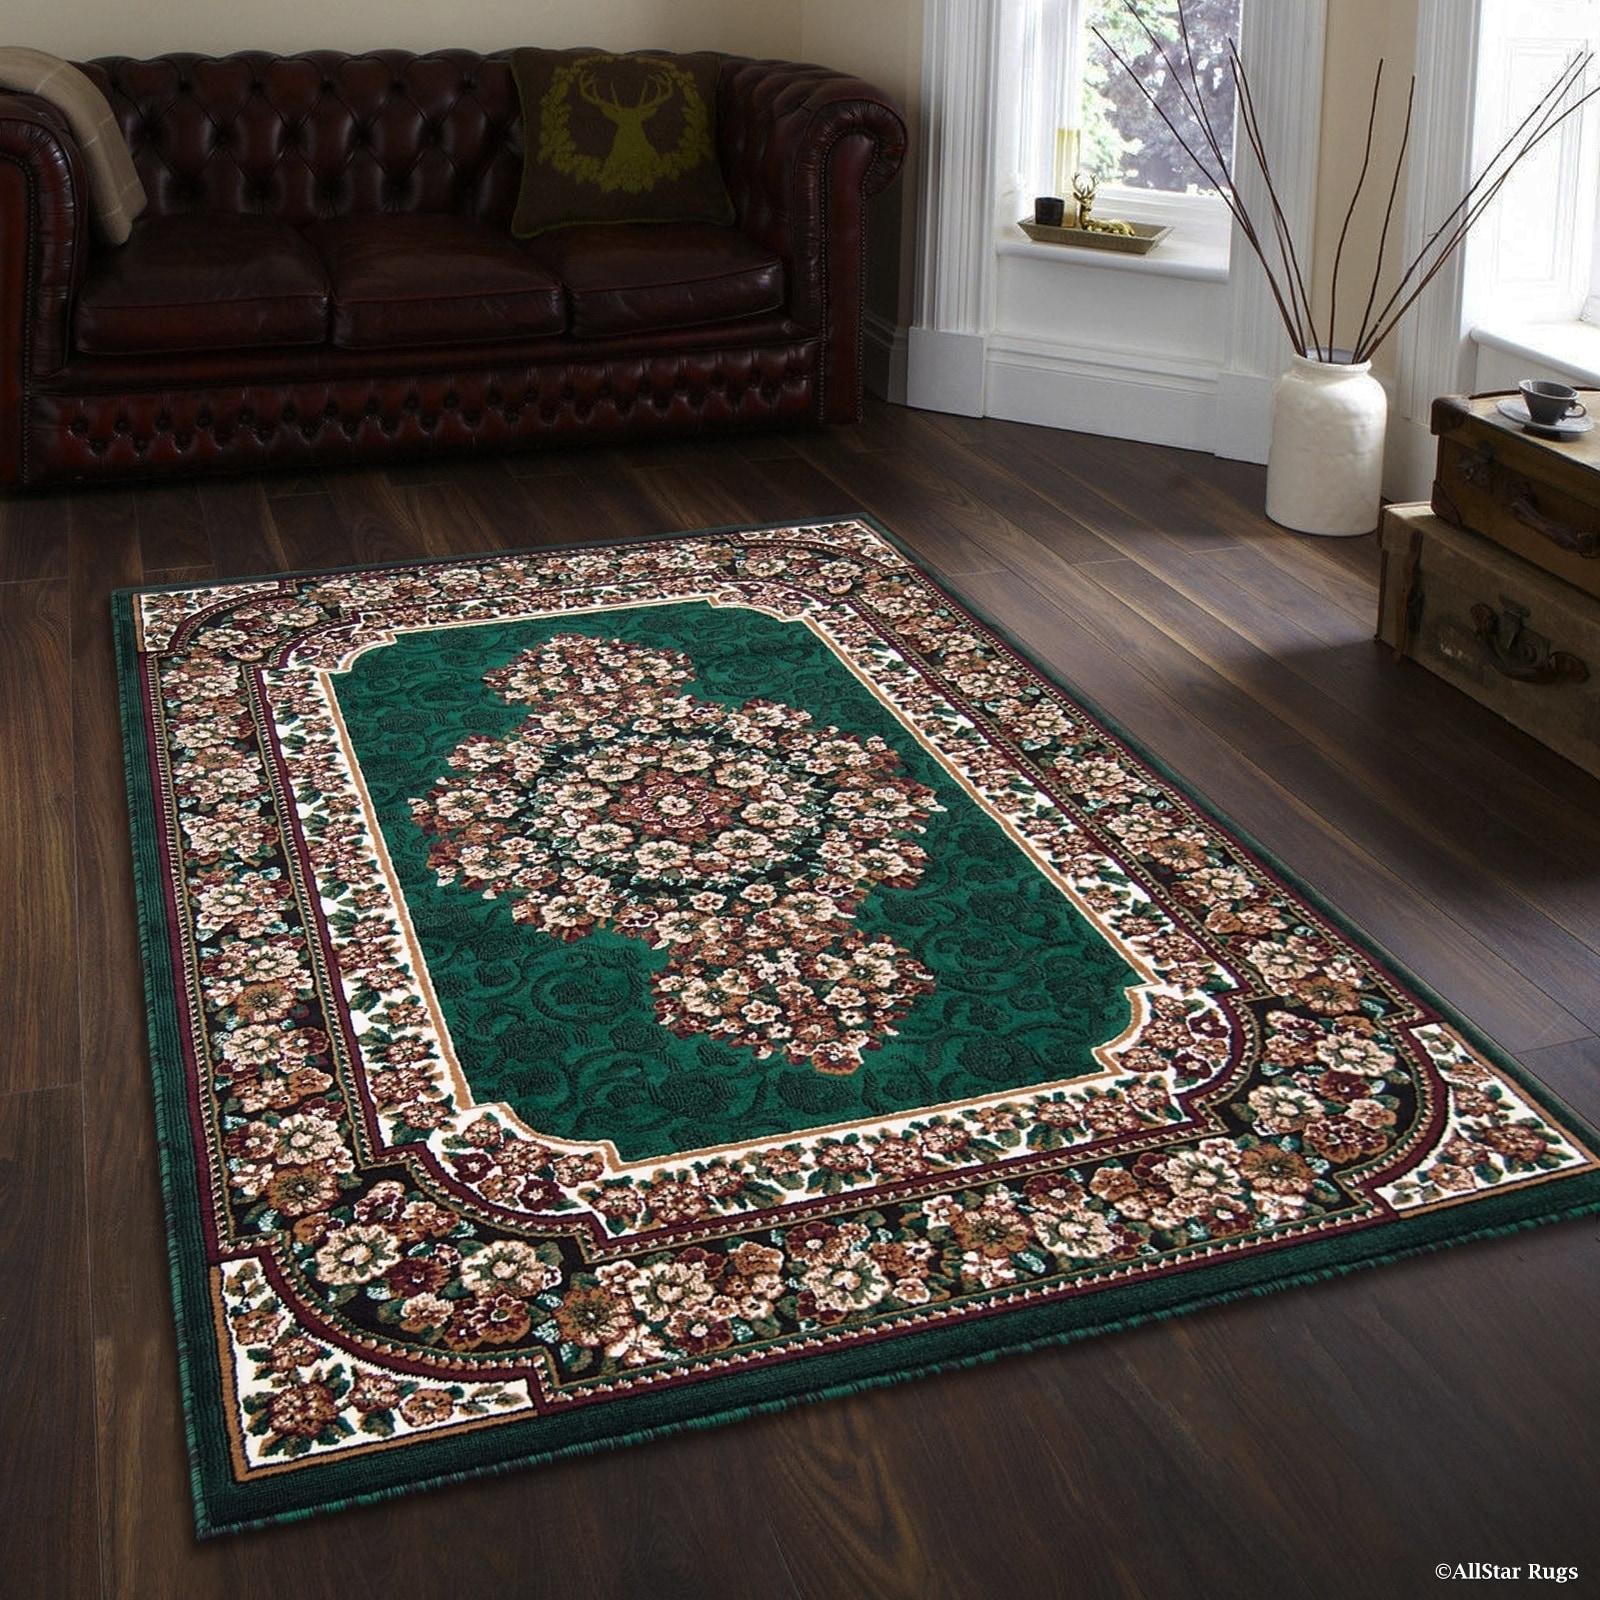 "Allstar Green/ Burgundy Woven Floral Printed Rug (7' 10"" ..."